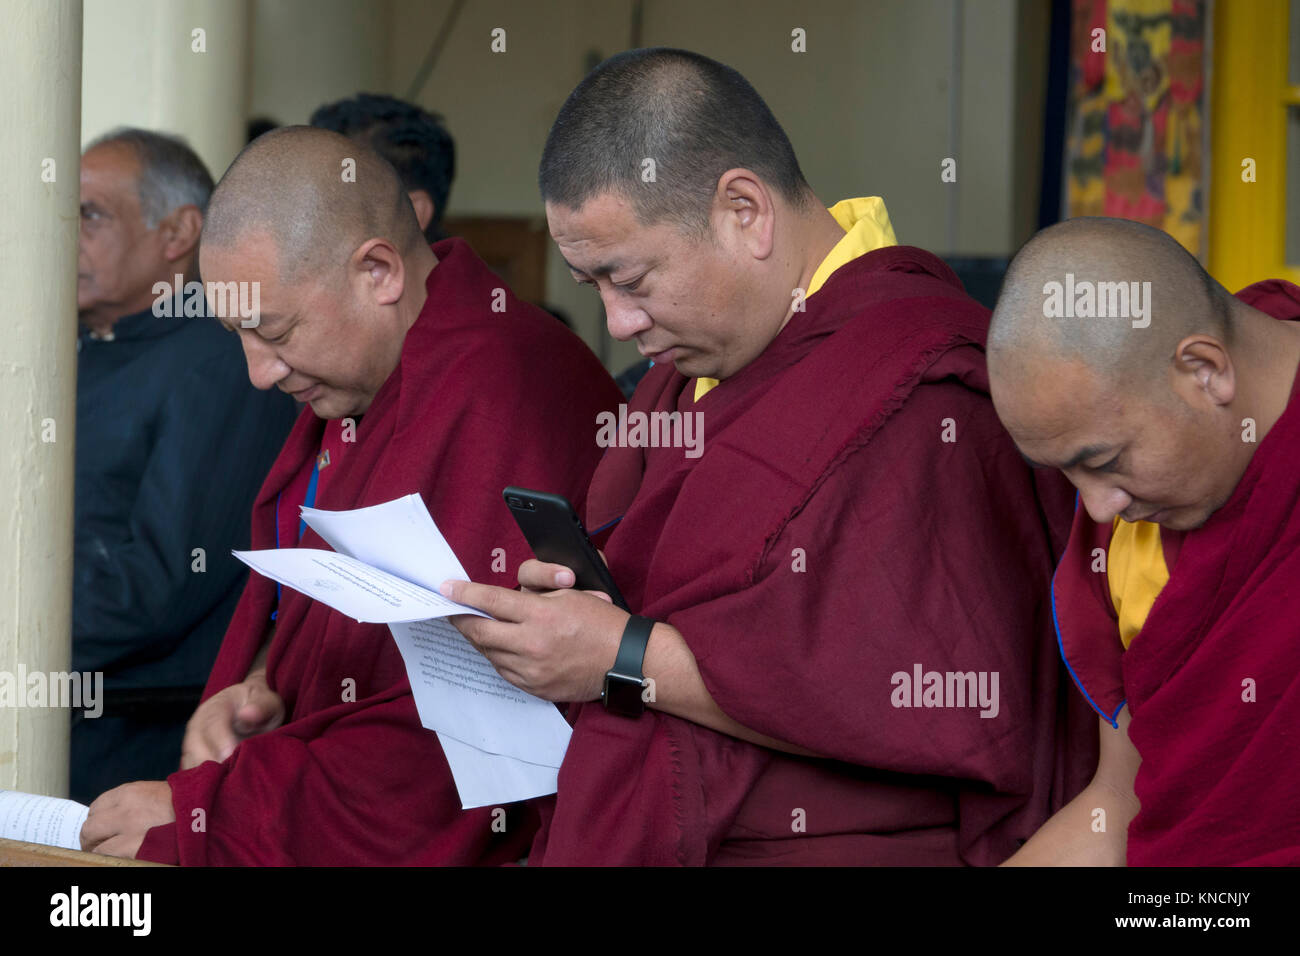 Buddhist monks at His Holiness Dalai Lama Main Temple in McLeod Ganj, India - Stock Image